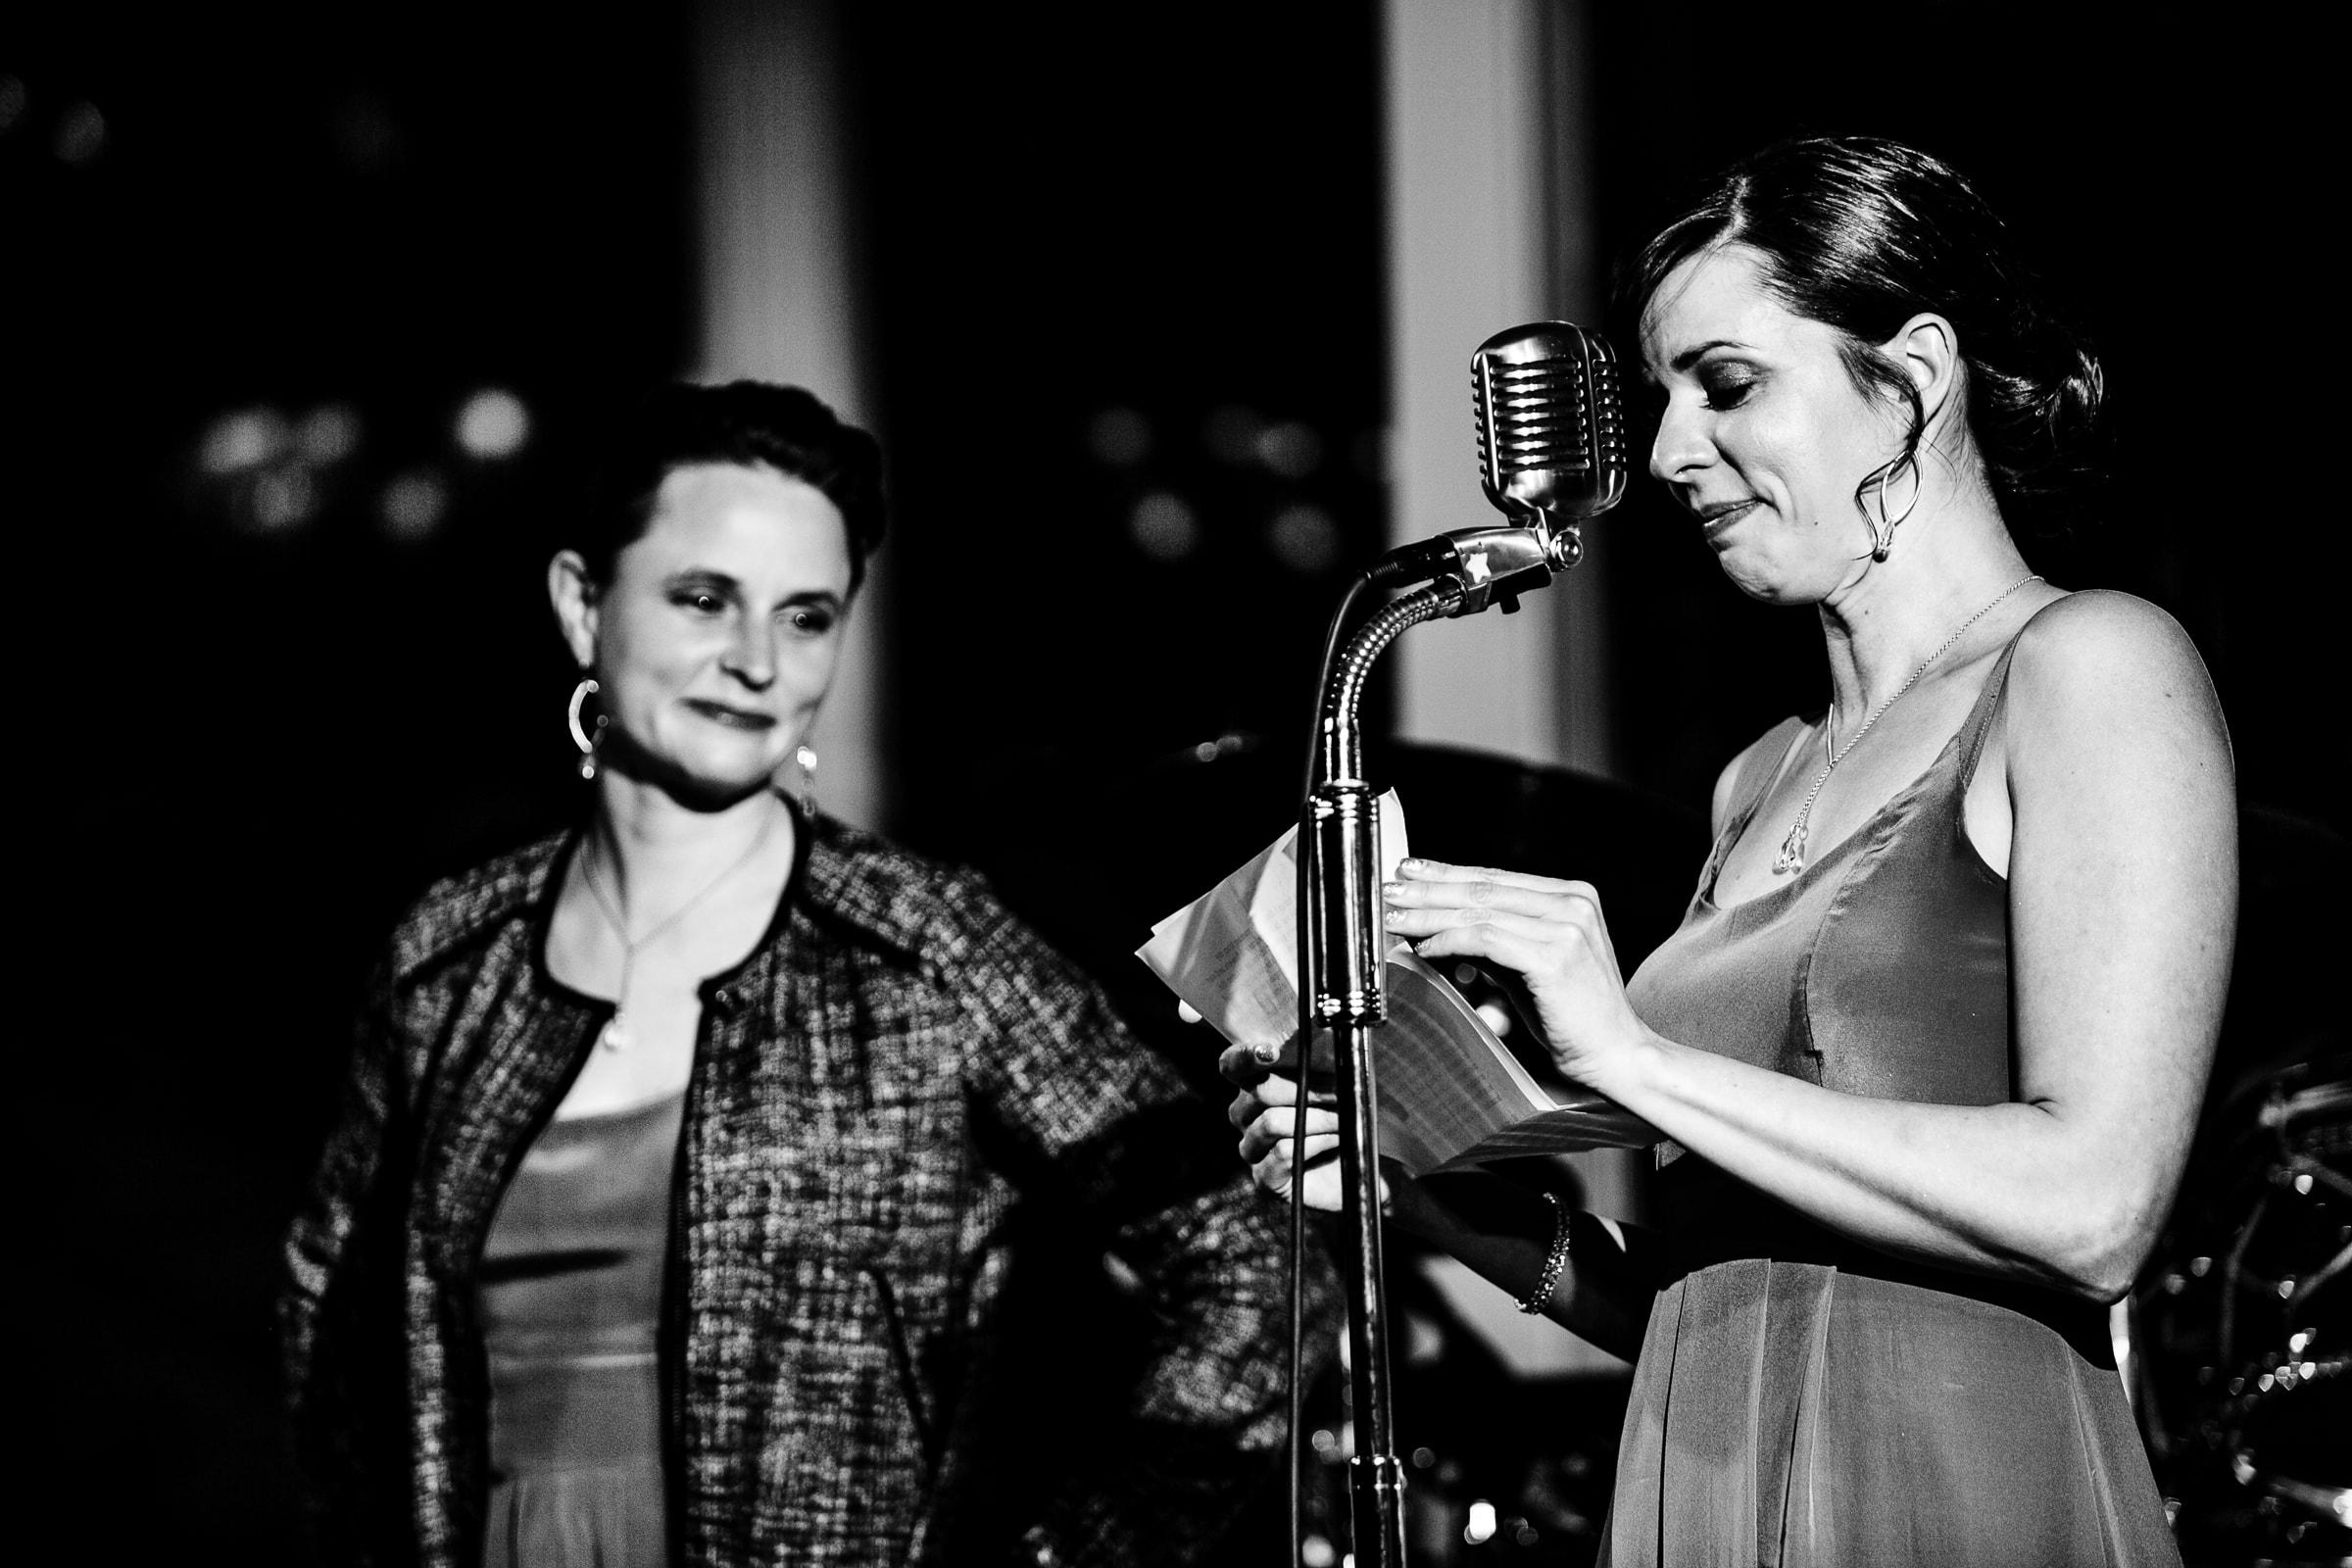 Emotional sisters speech during their Waverley Country Club wedding reception